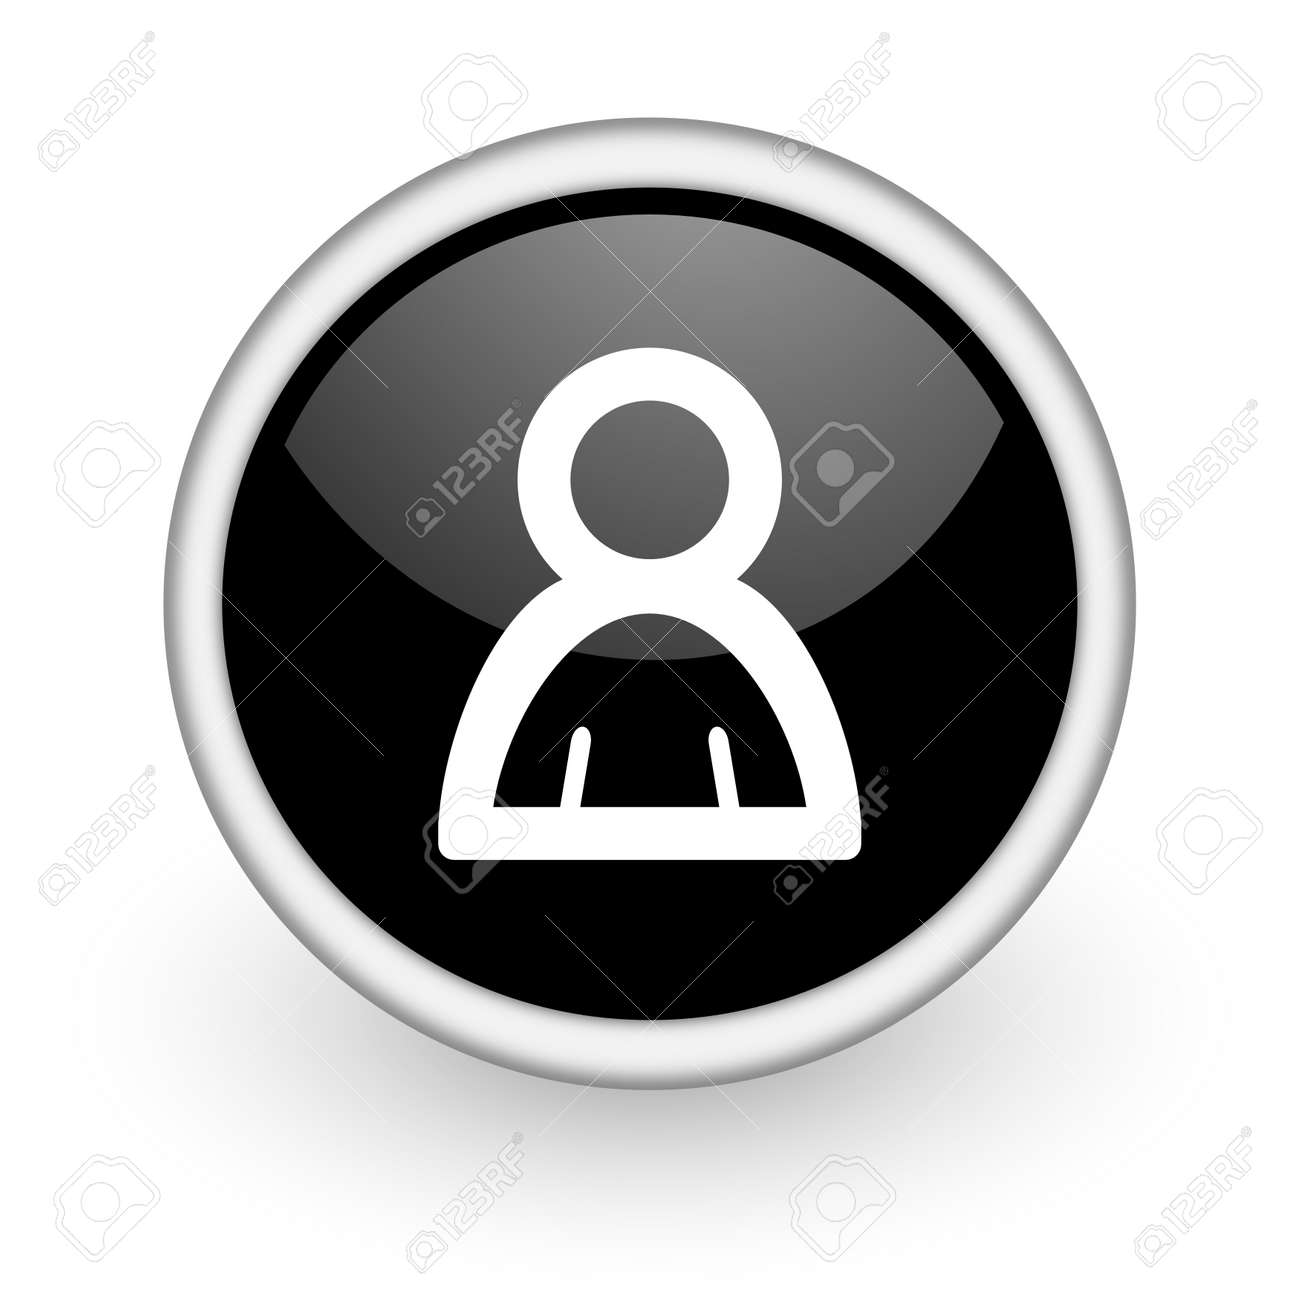 black round icon on white background with shadow Stock Photo - 14358709